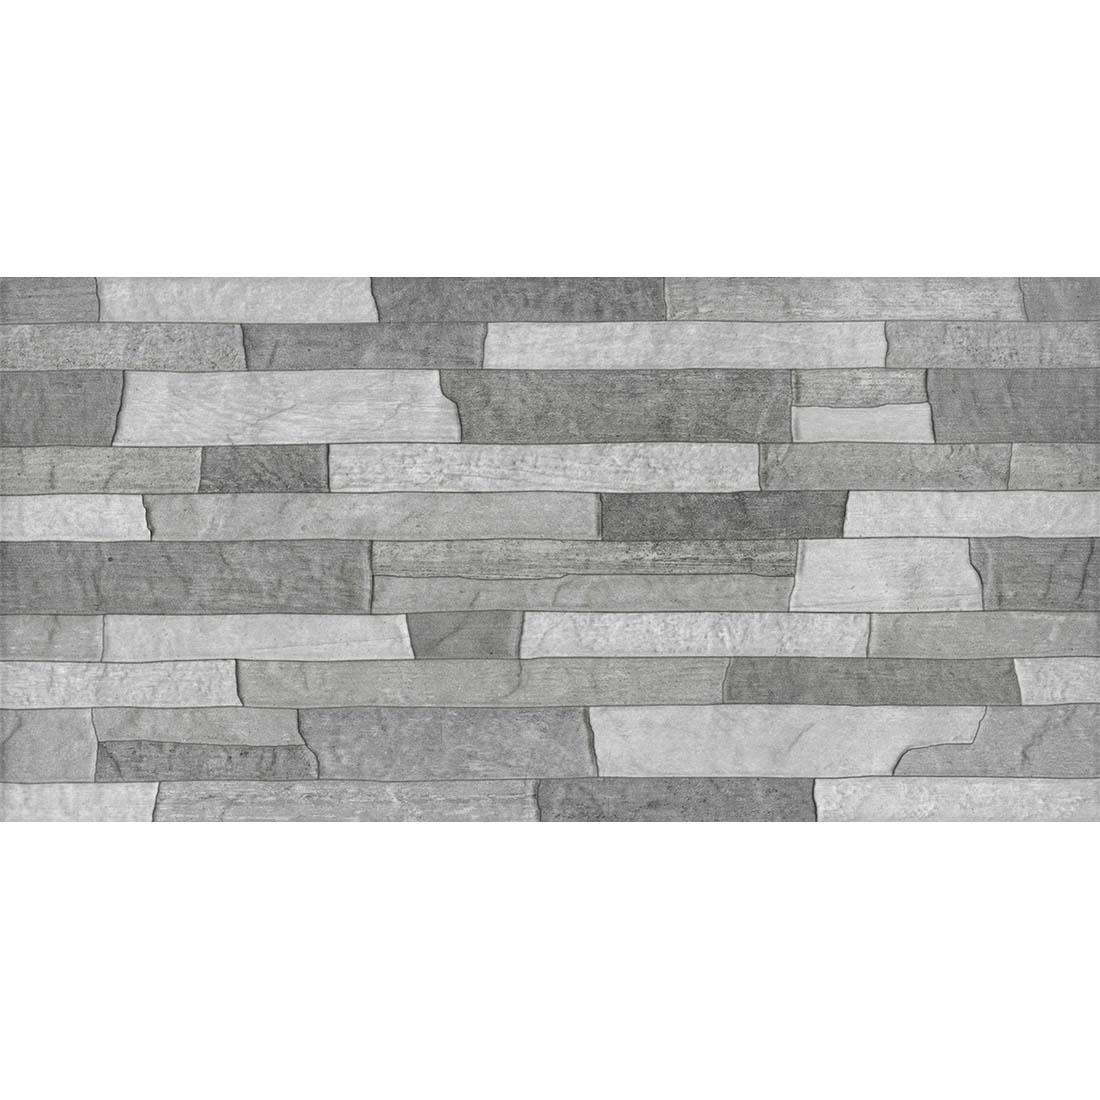 Cemento Rustico Mix Decor 30x60 Grey Matt 1